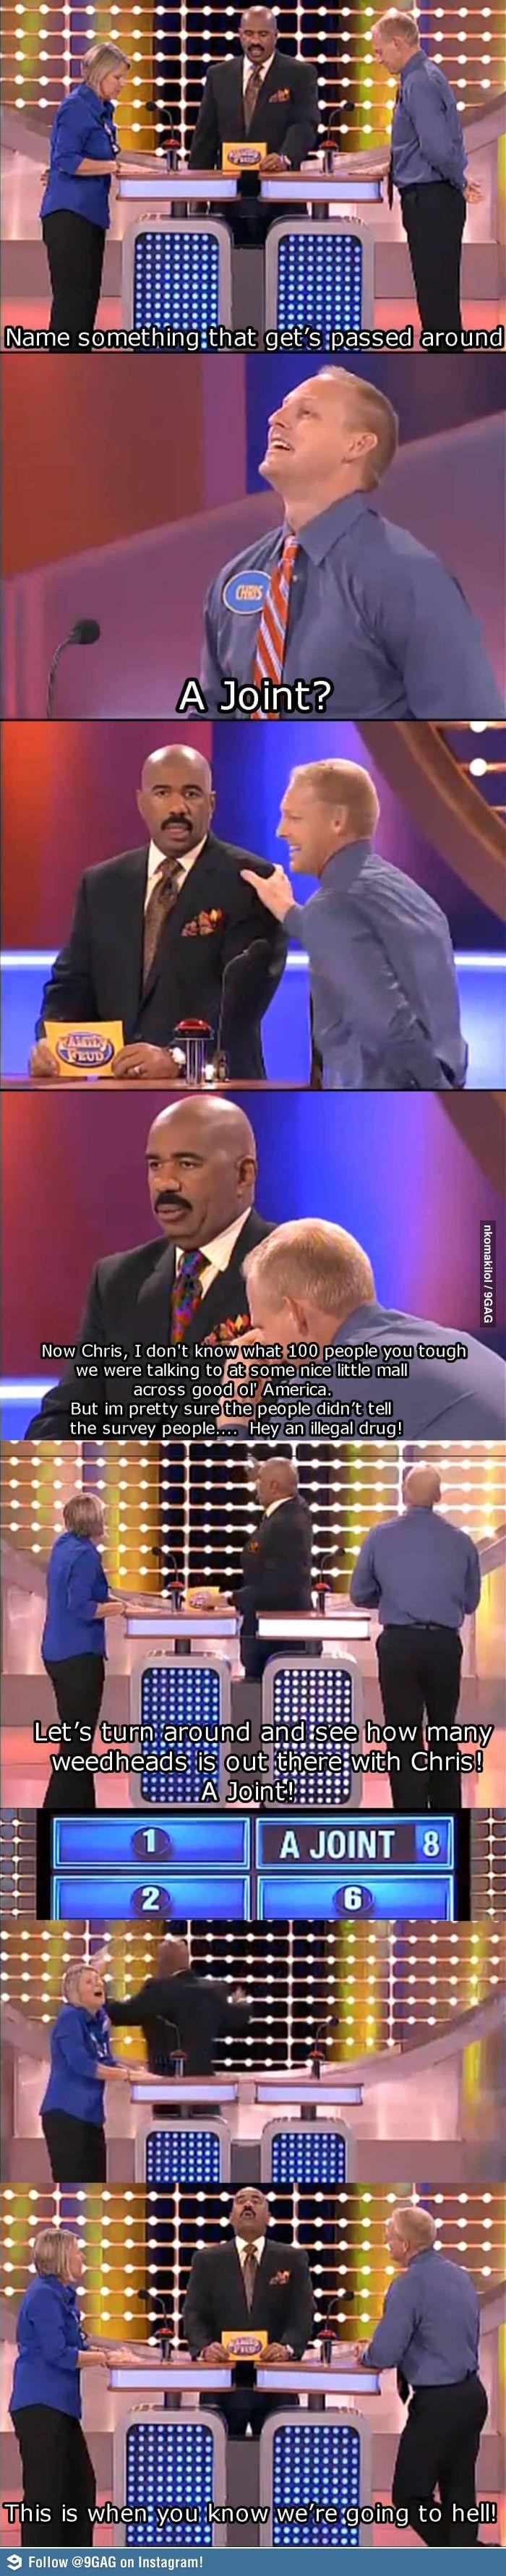 Hahahahahah love this!